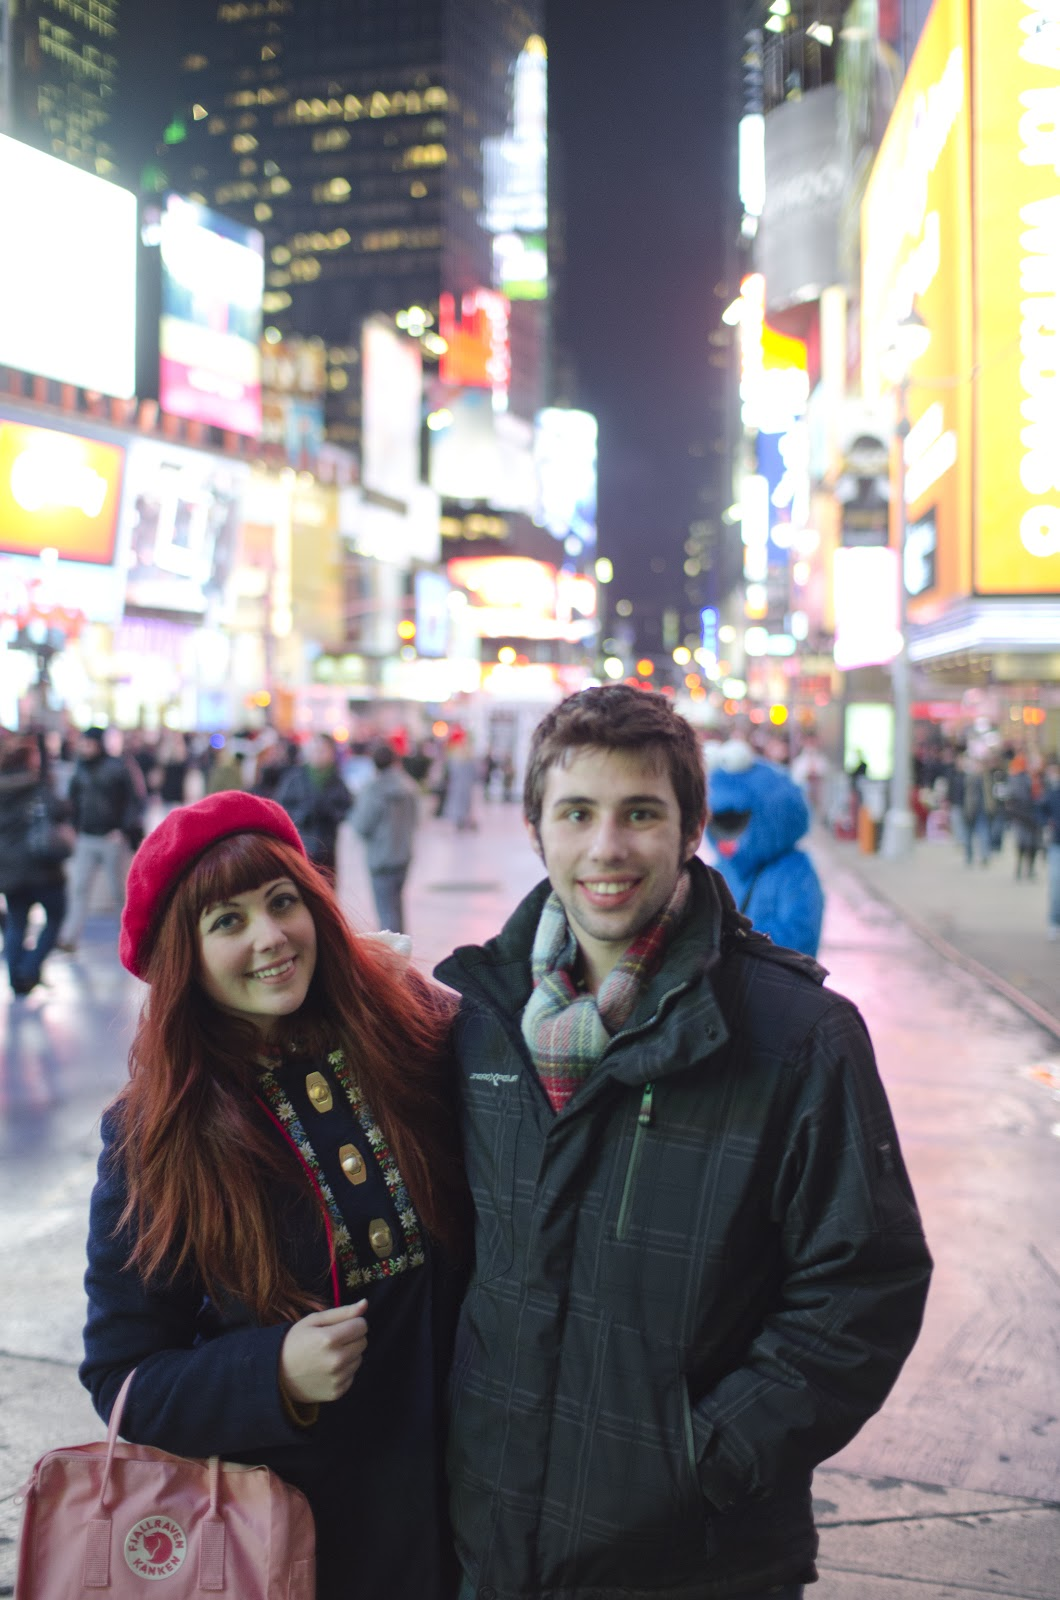 Fjallraven Kanken, Times Square